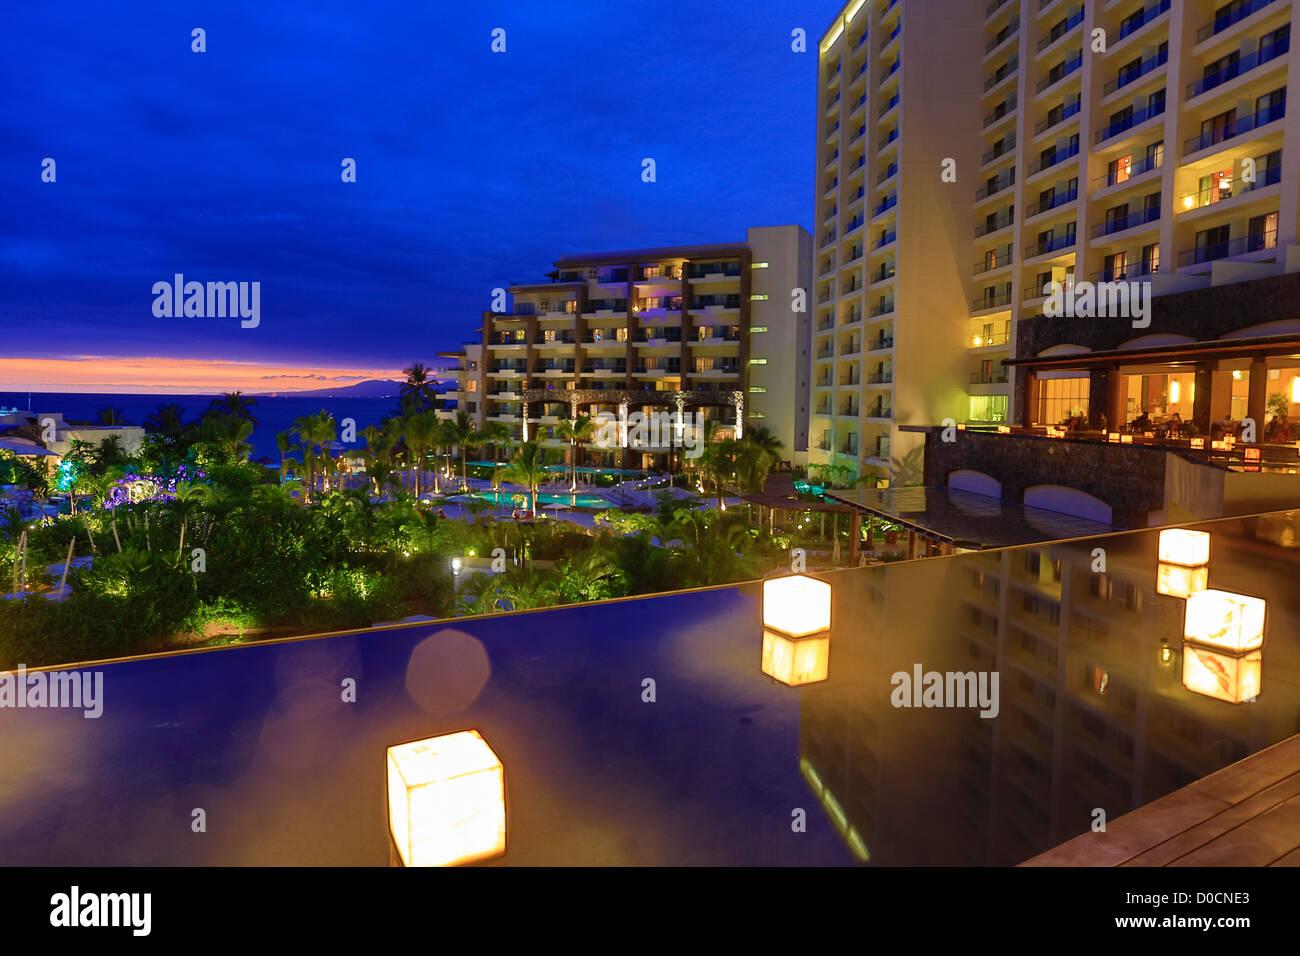 Secrets Resort, Puerto Vallarta, Jalisco, Mexico - Stock Image